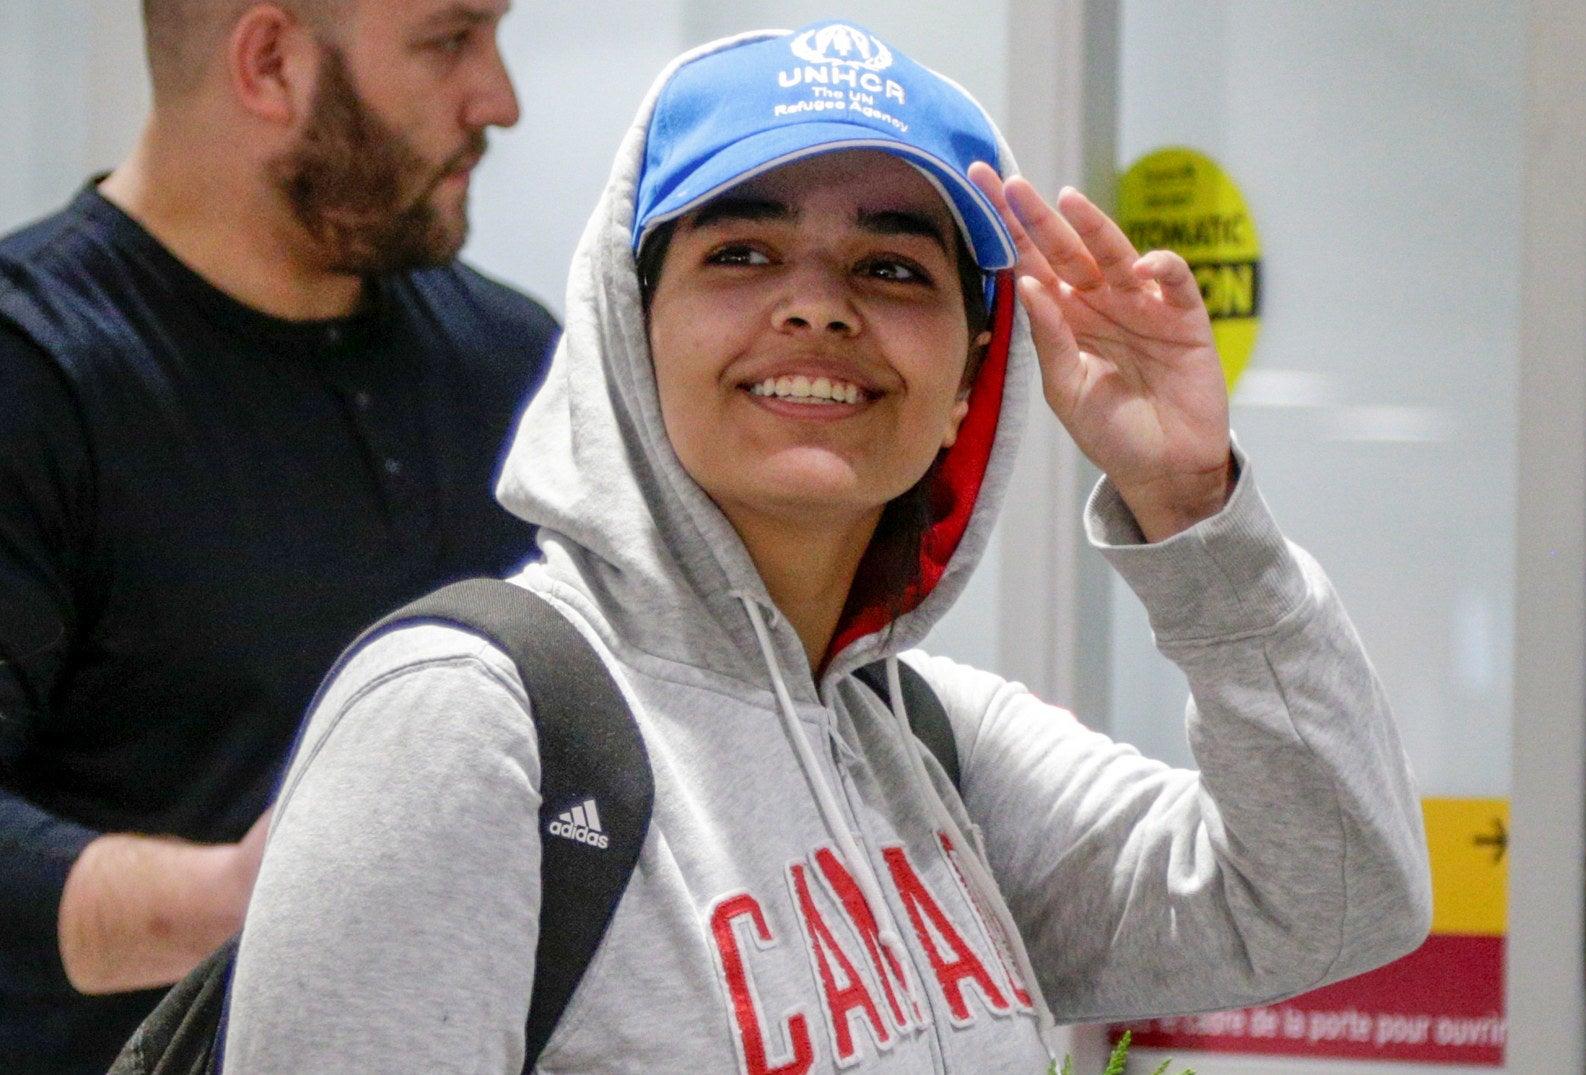 Qunun arrives at Toronto Pearson International Airport Jan. 12.